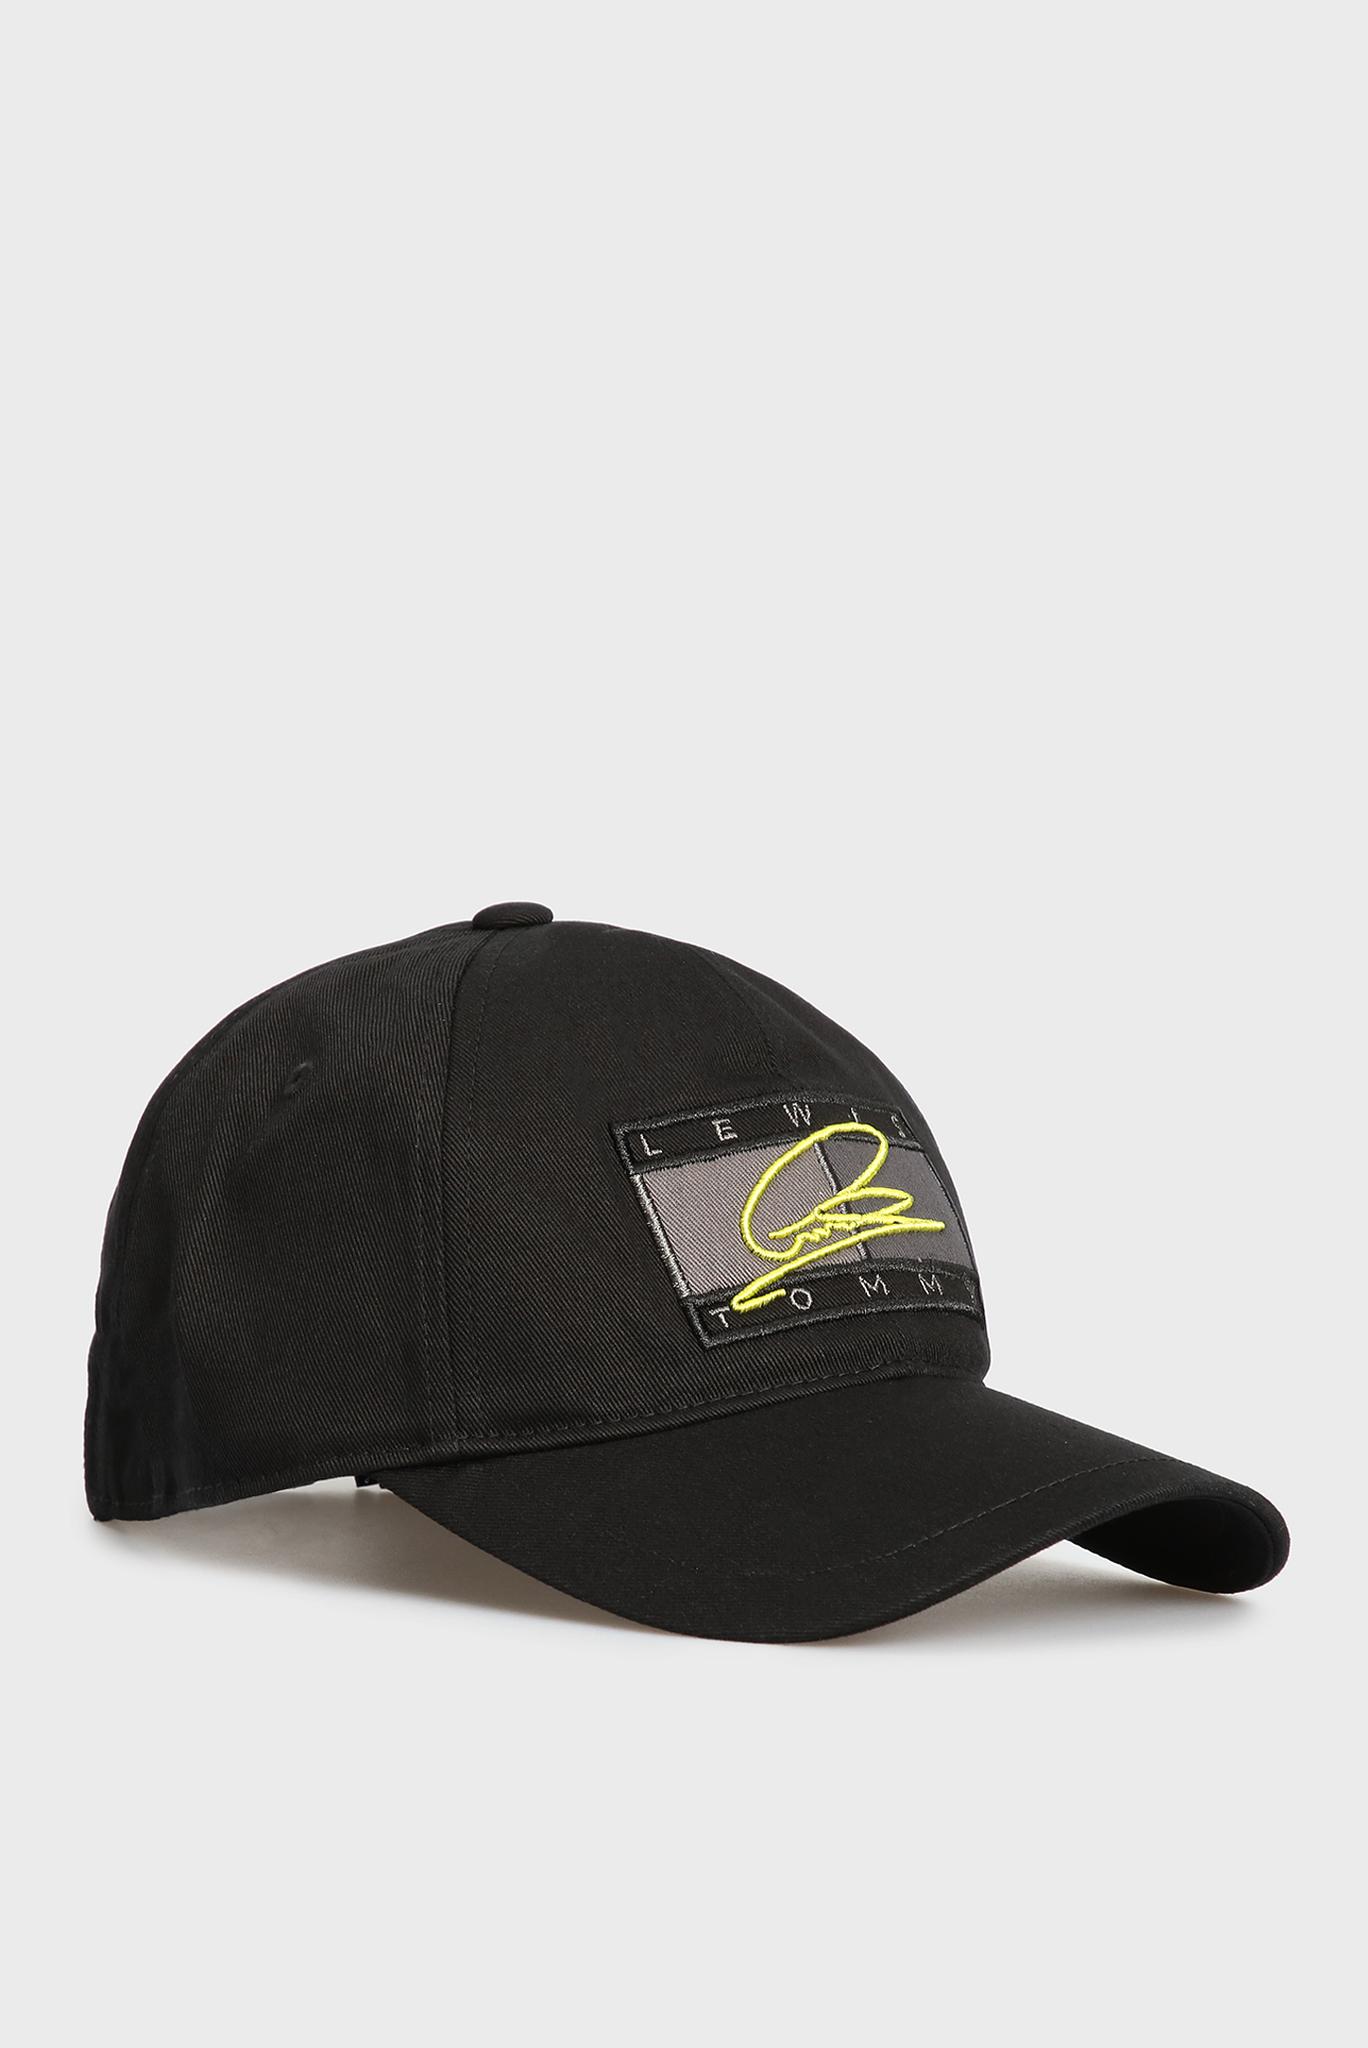 Мужская черная кепка Lewis Hamilton 3 Tommy Hilfiger